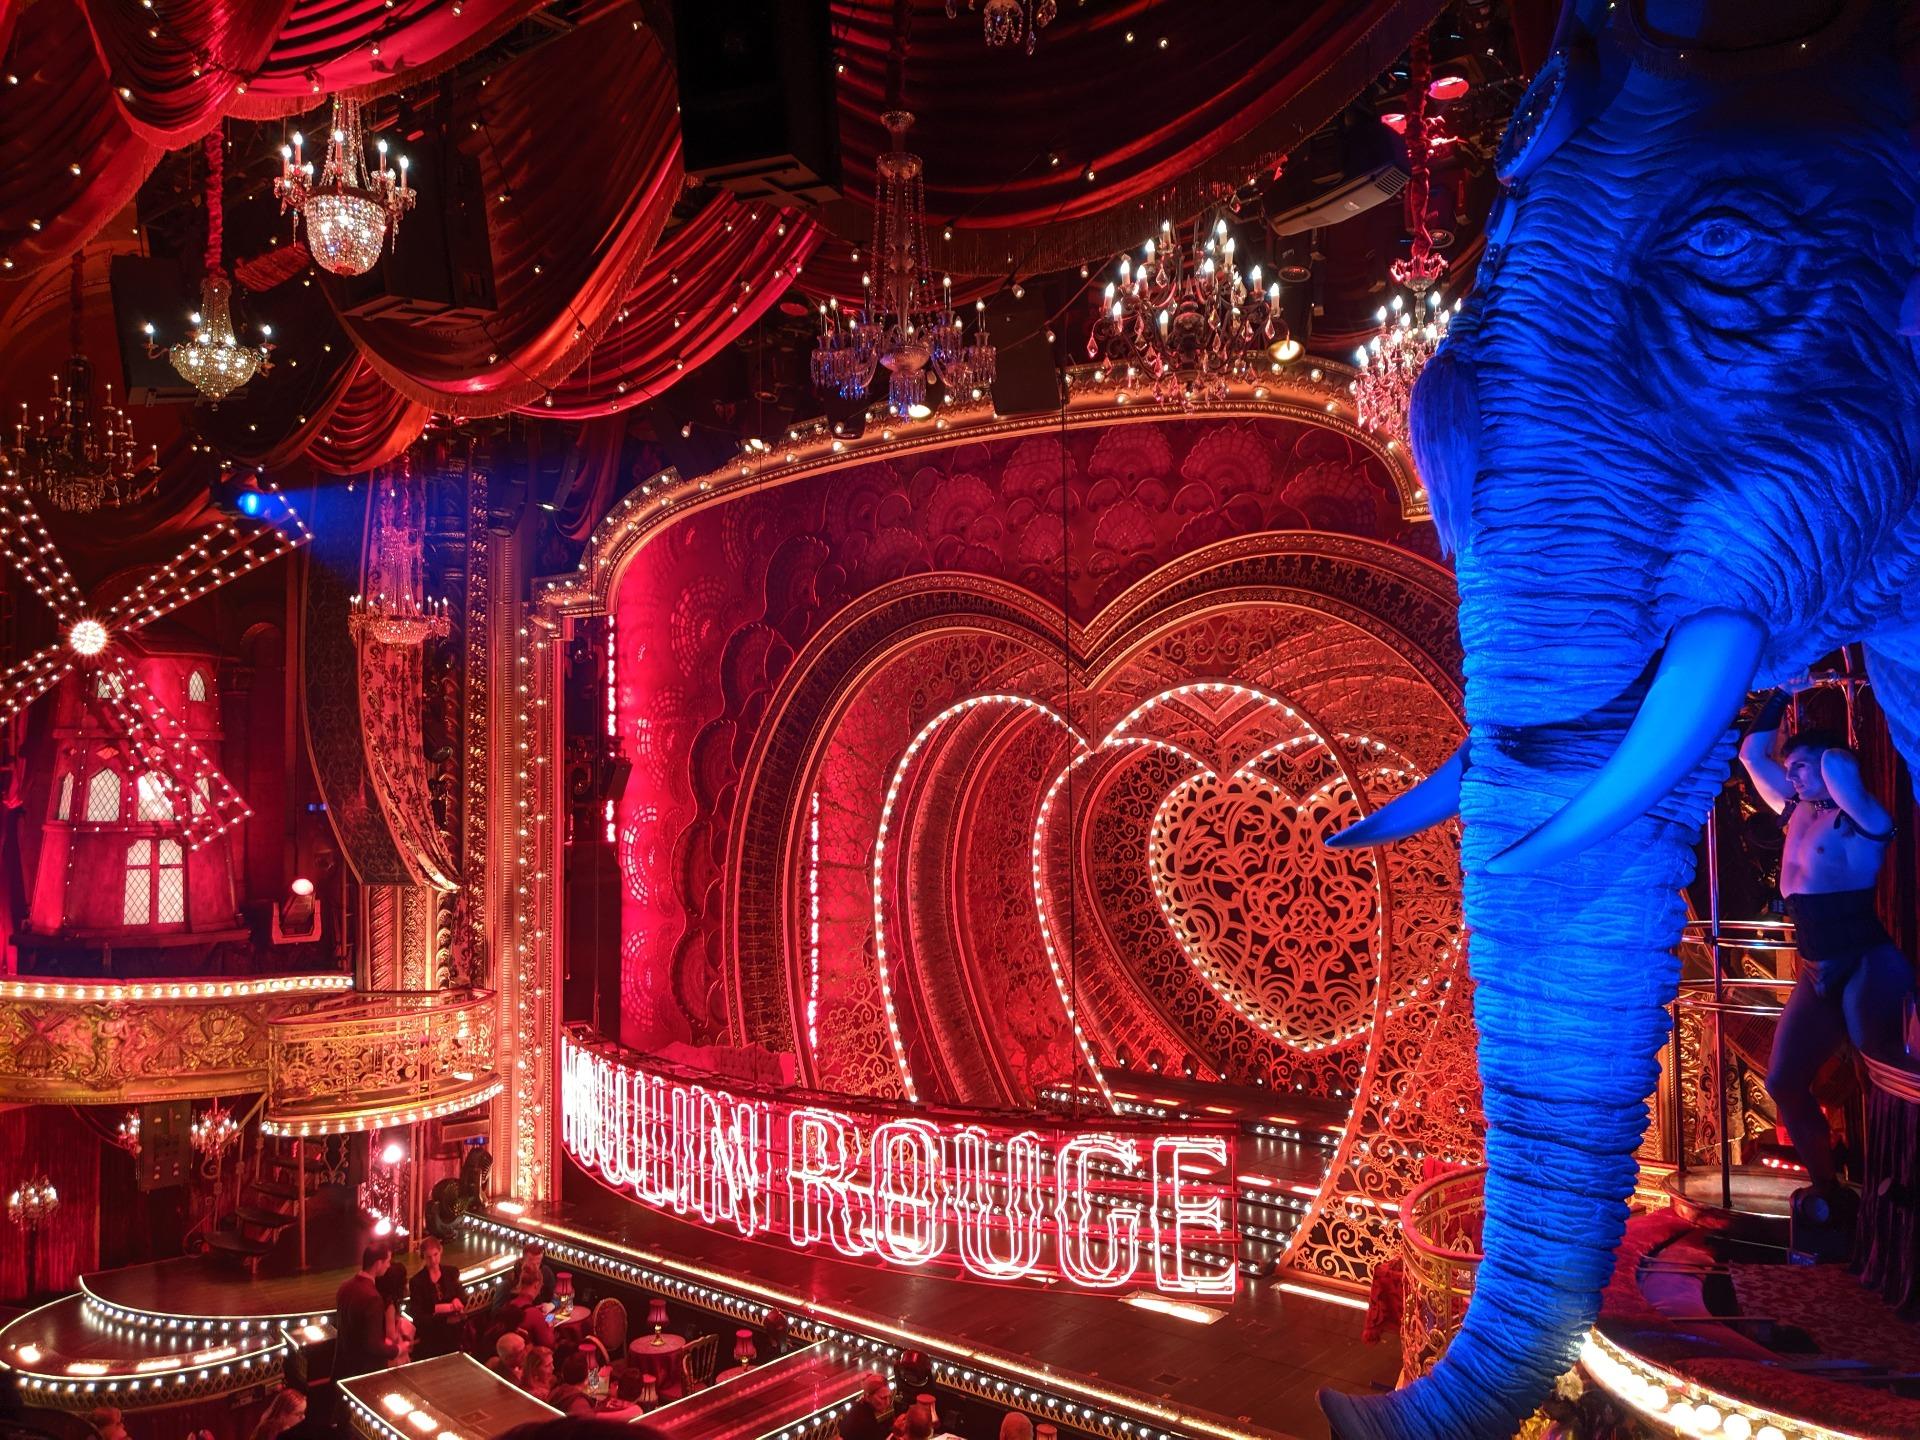 Al Hirschfeld Theatre Section Mezzanine R Row B Seat 18